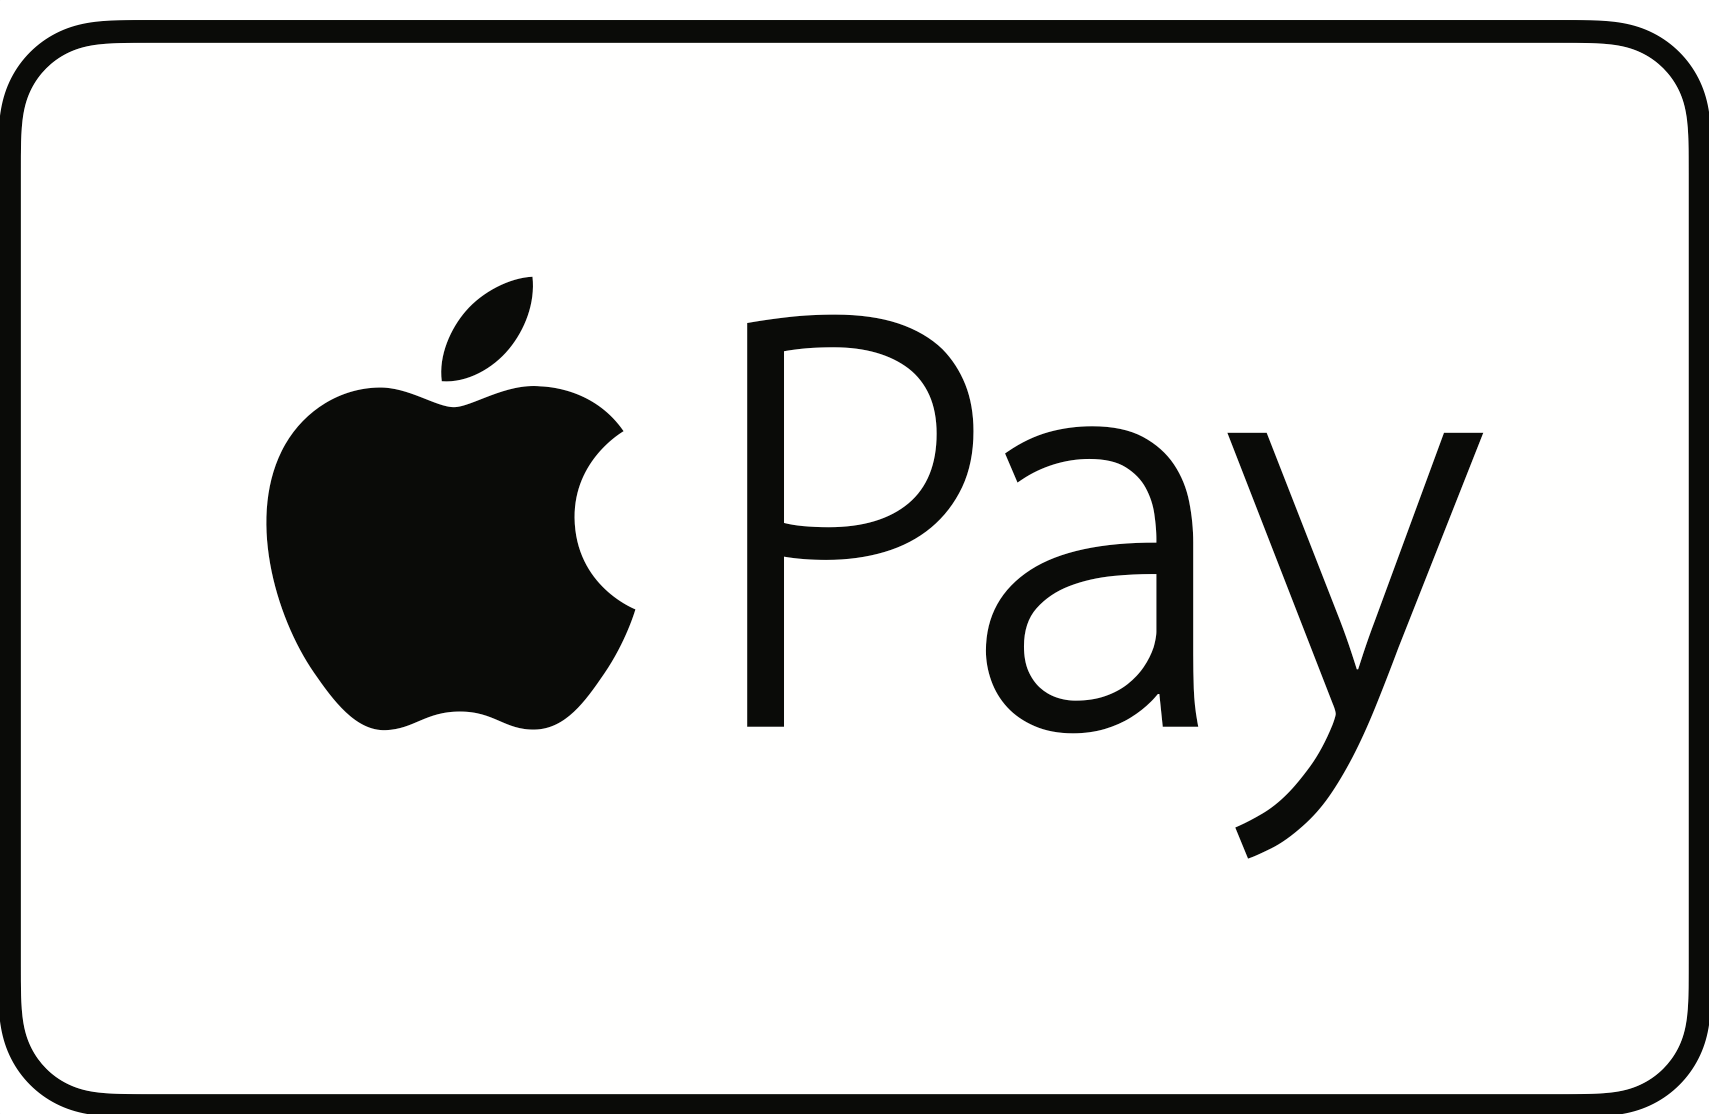 Apple Pay beschikbaar in België - Spaargids.be